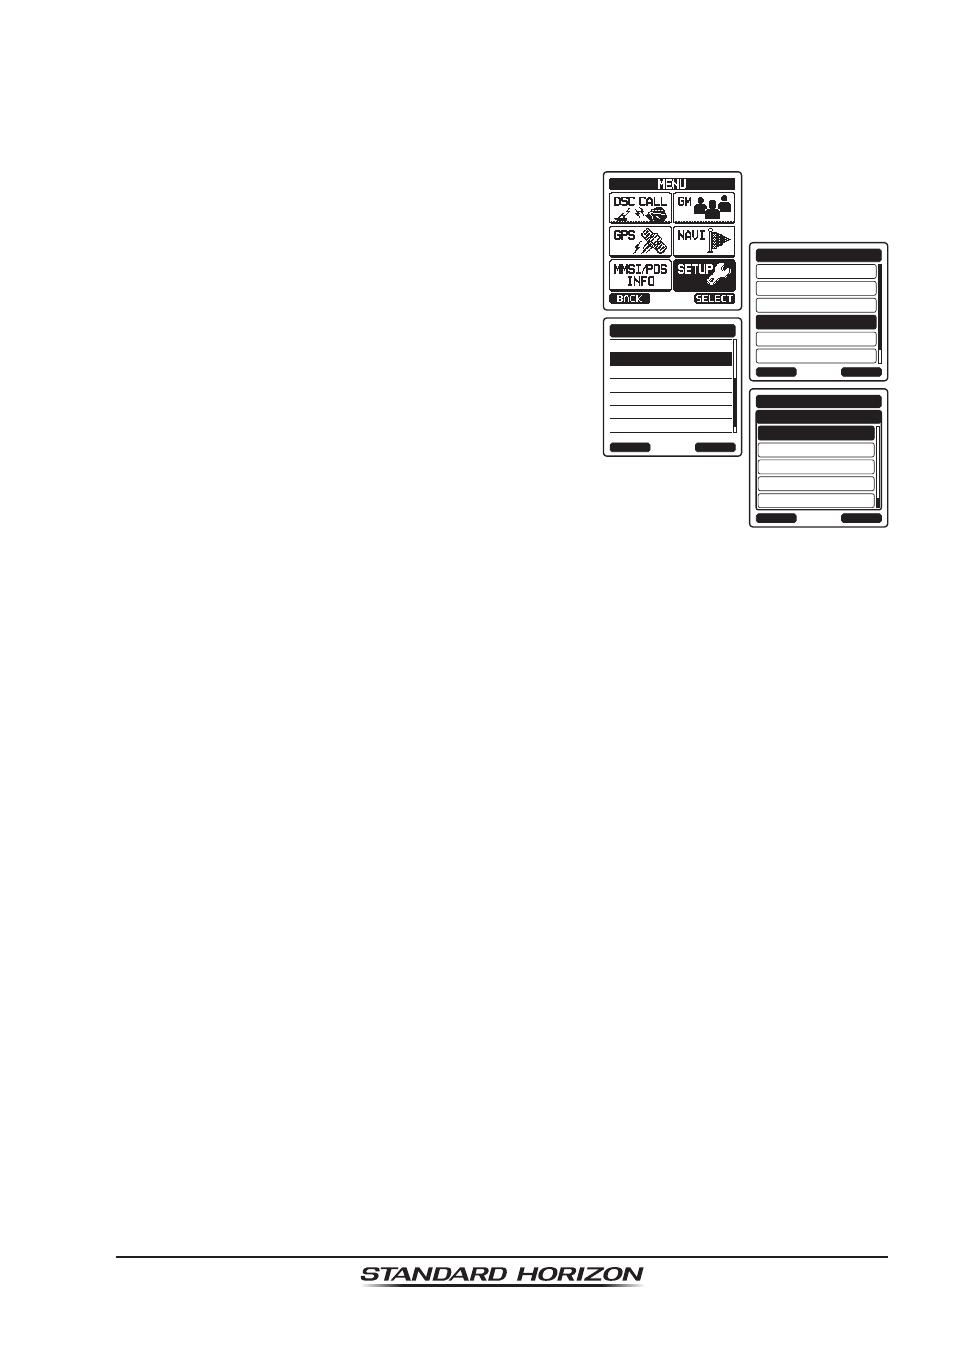 8 sub channel standard horizon hx 870 user manual page 103 140 rh manualsdir com standard horizon hx870 user manual standard horizon cp300i user manual